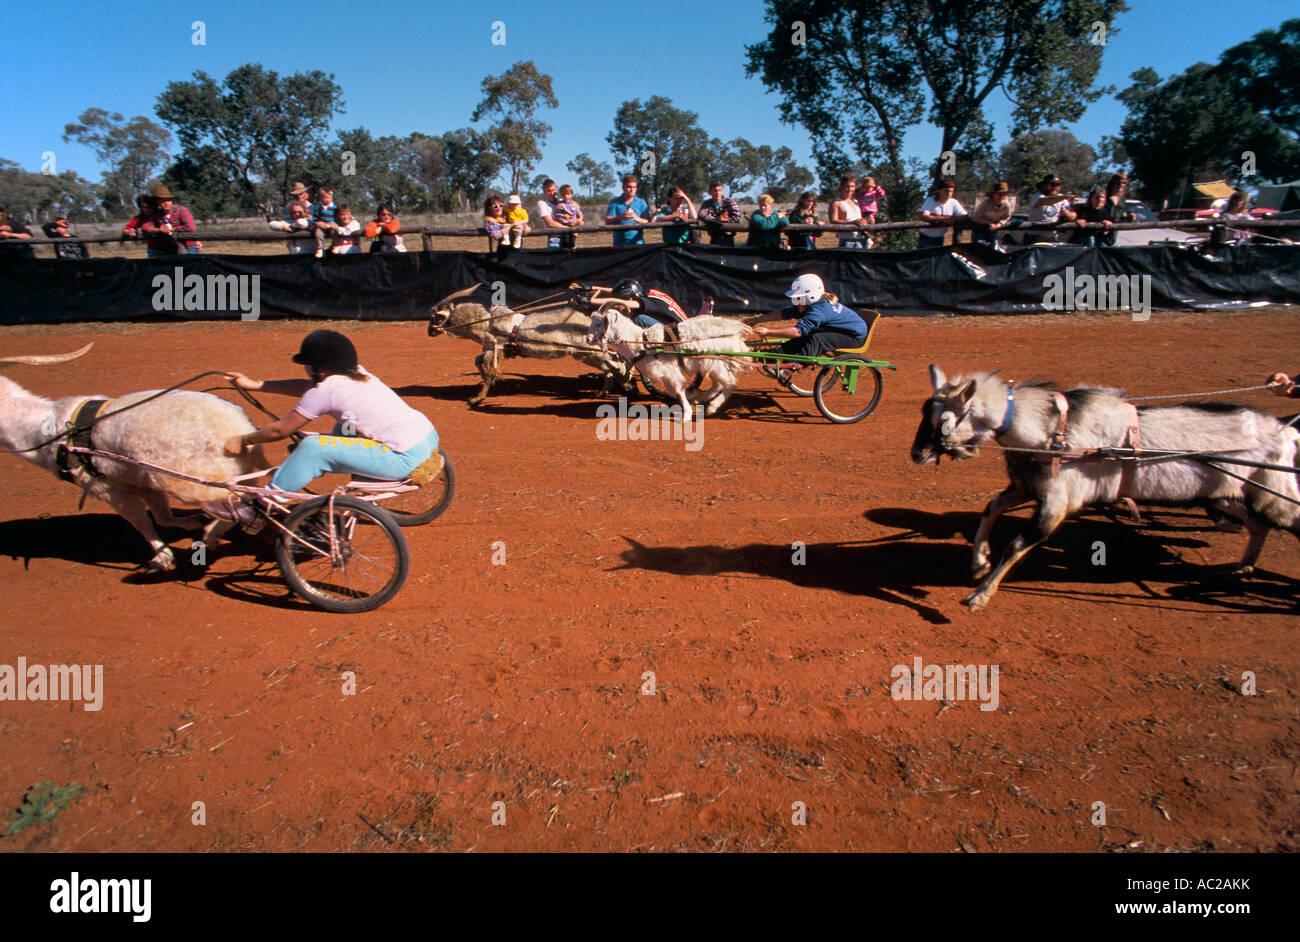 Goat Races, outback Australia - Stock Image